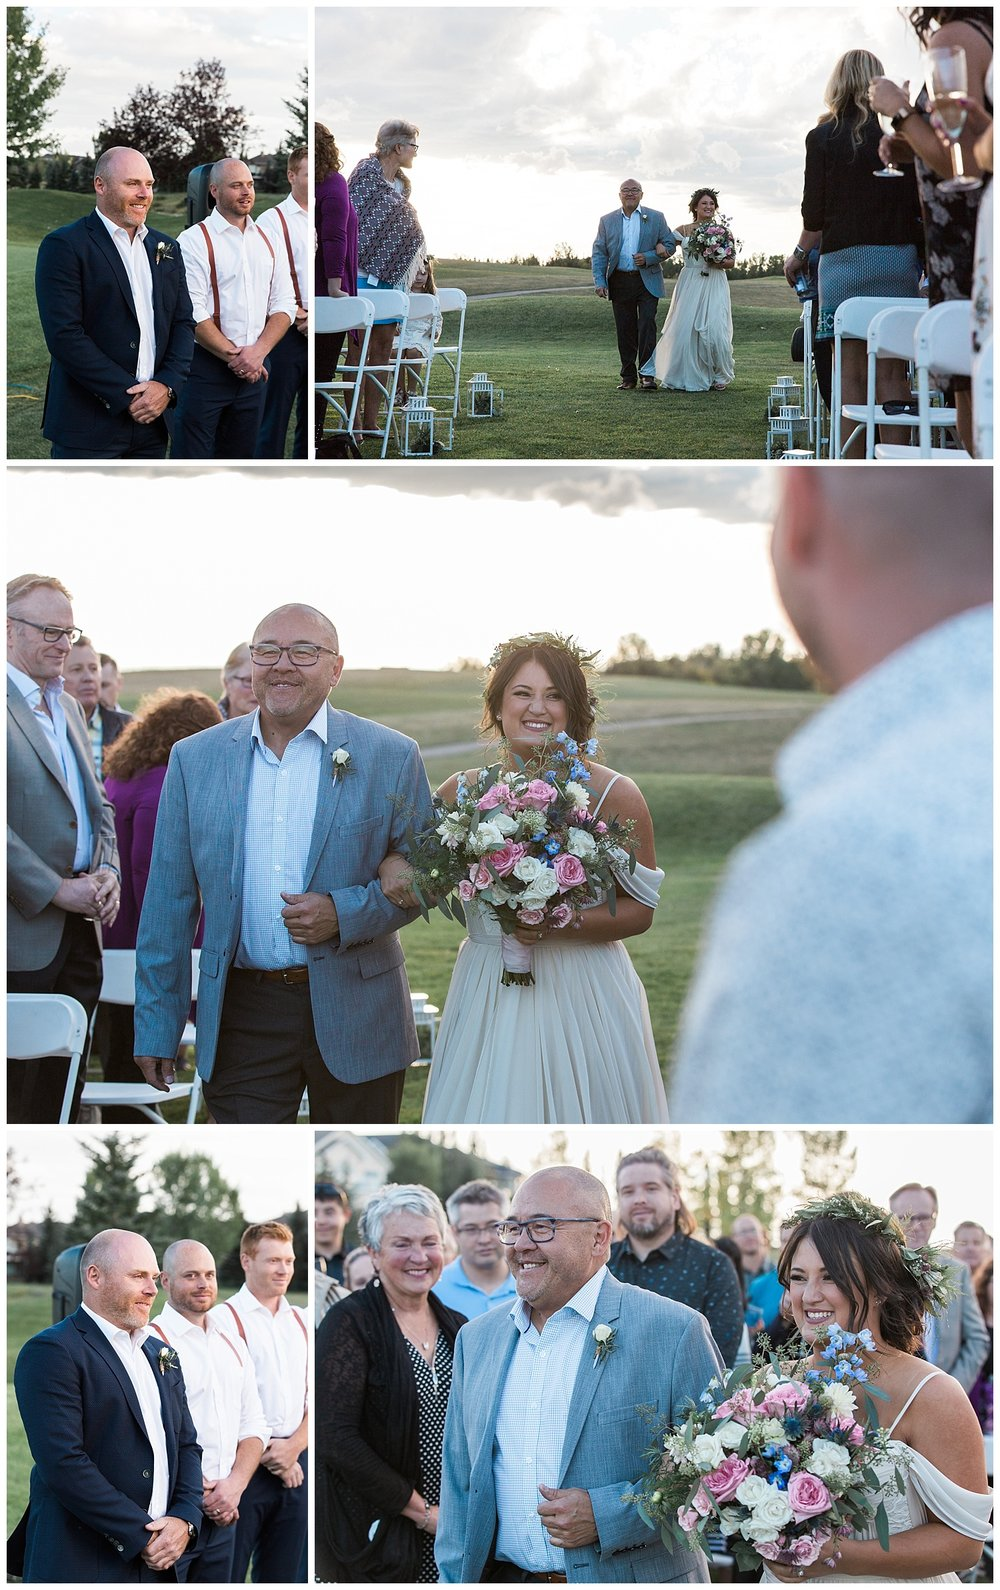 Calgary-wedding-photographer-springbank-links-golf-course-_0014.jpg